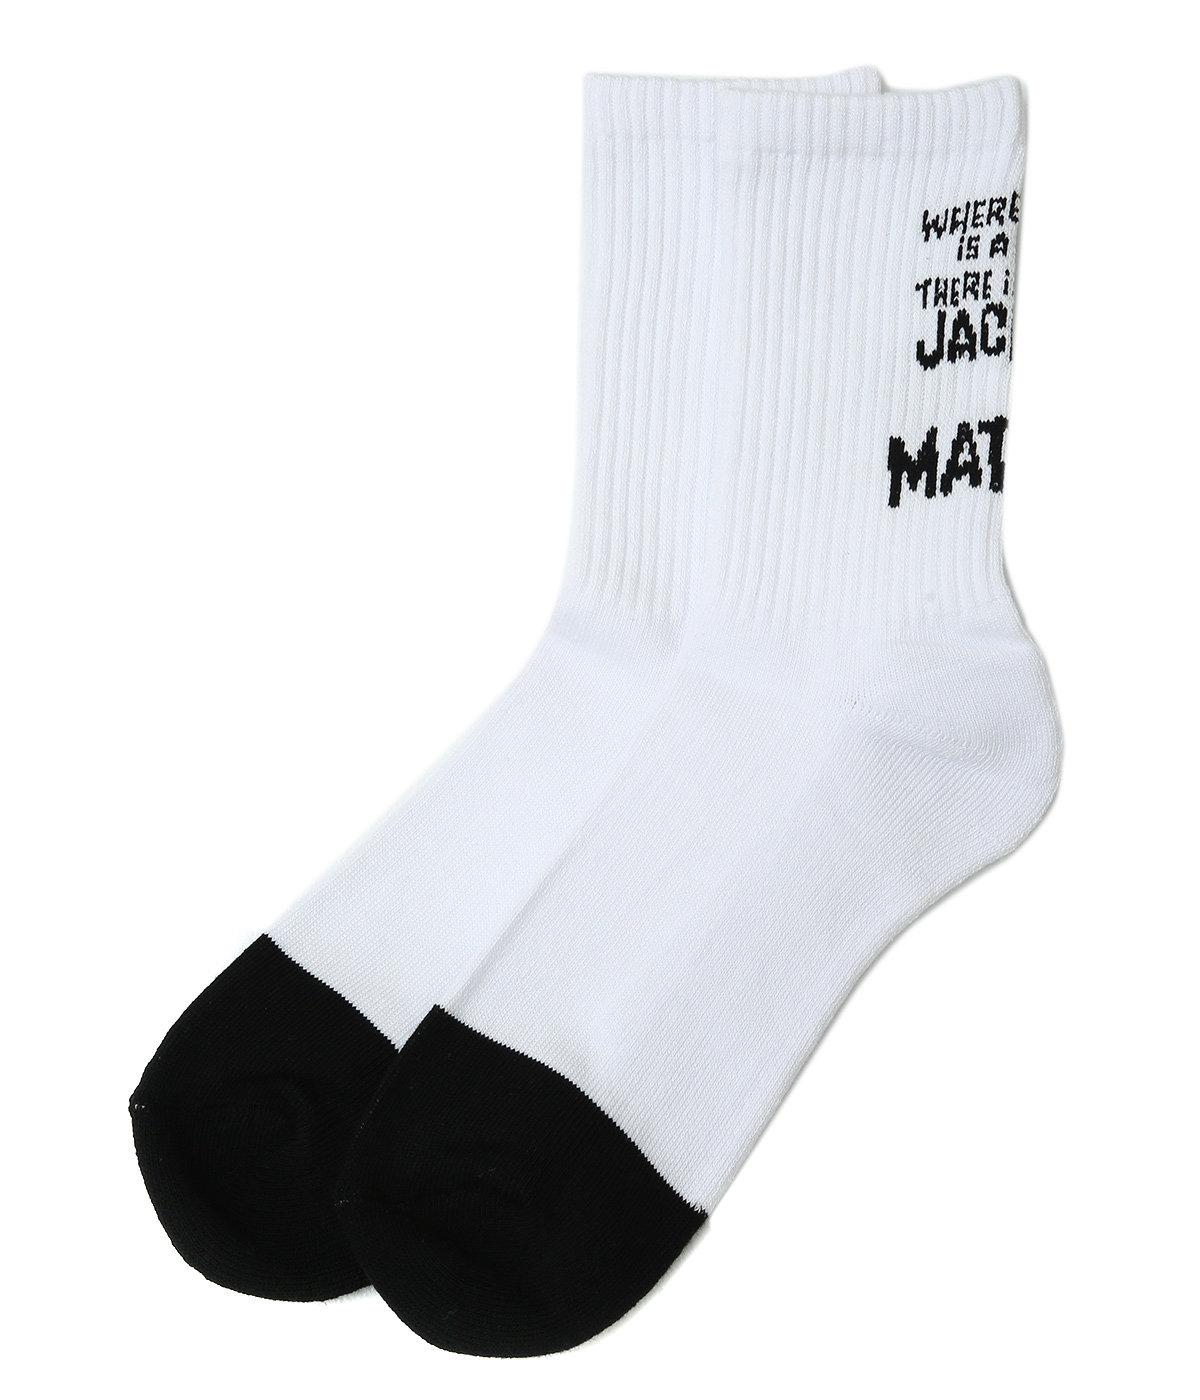 ROASTER SOX x JM Socks